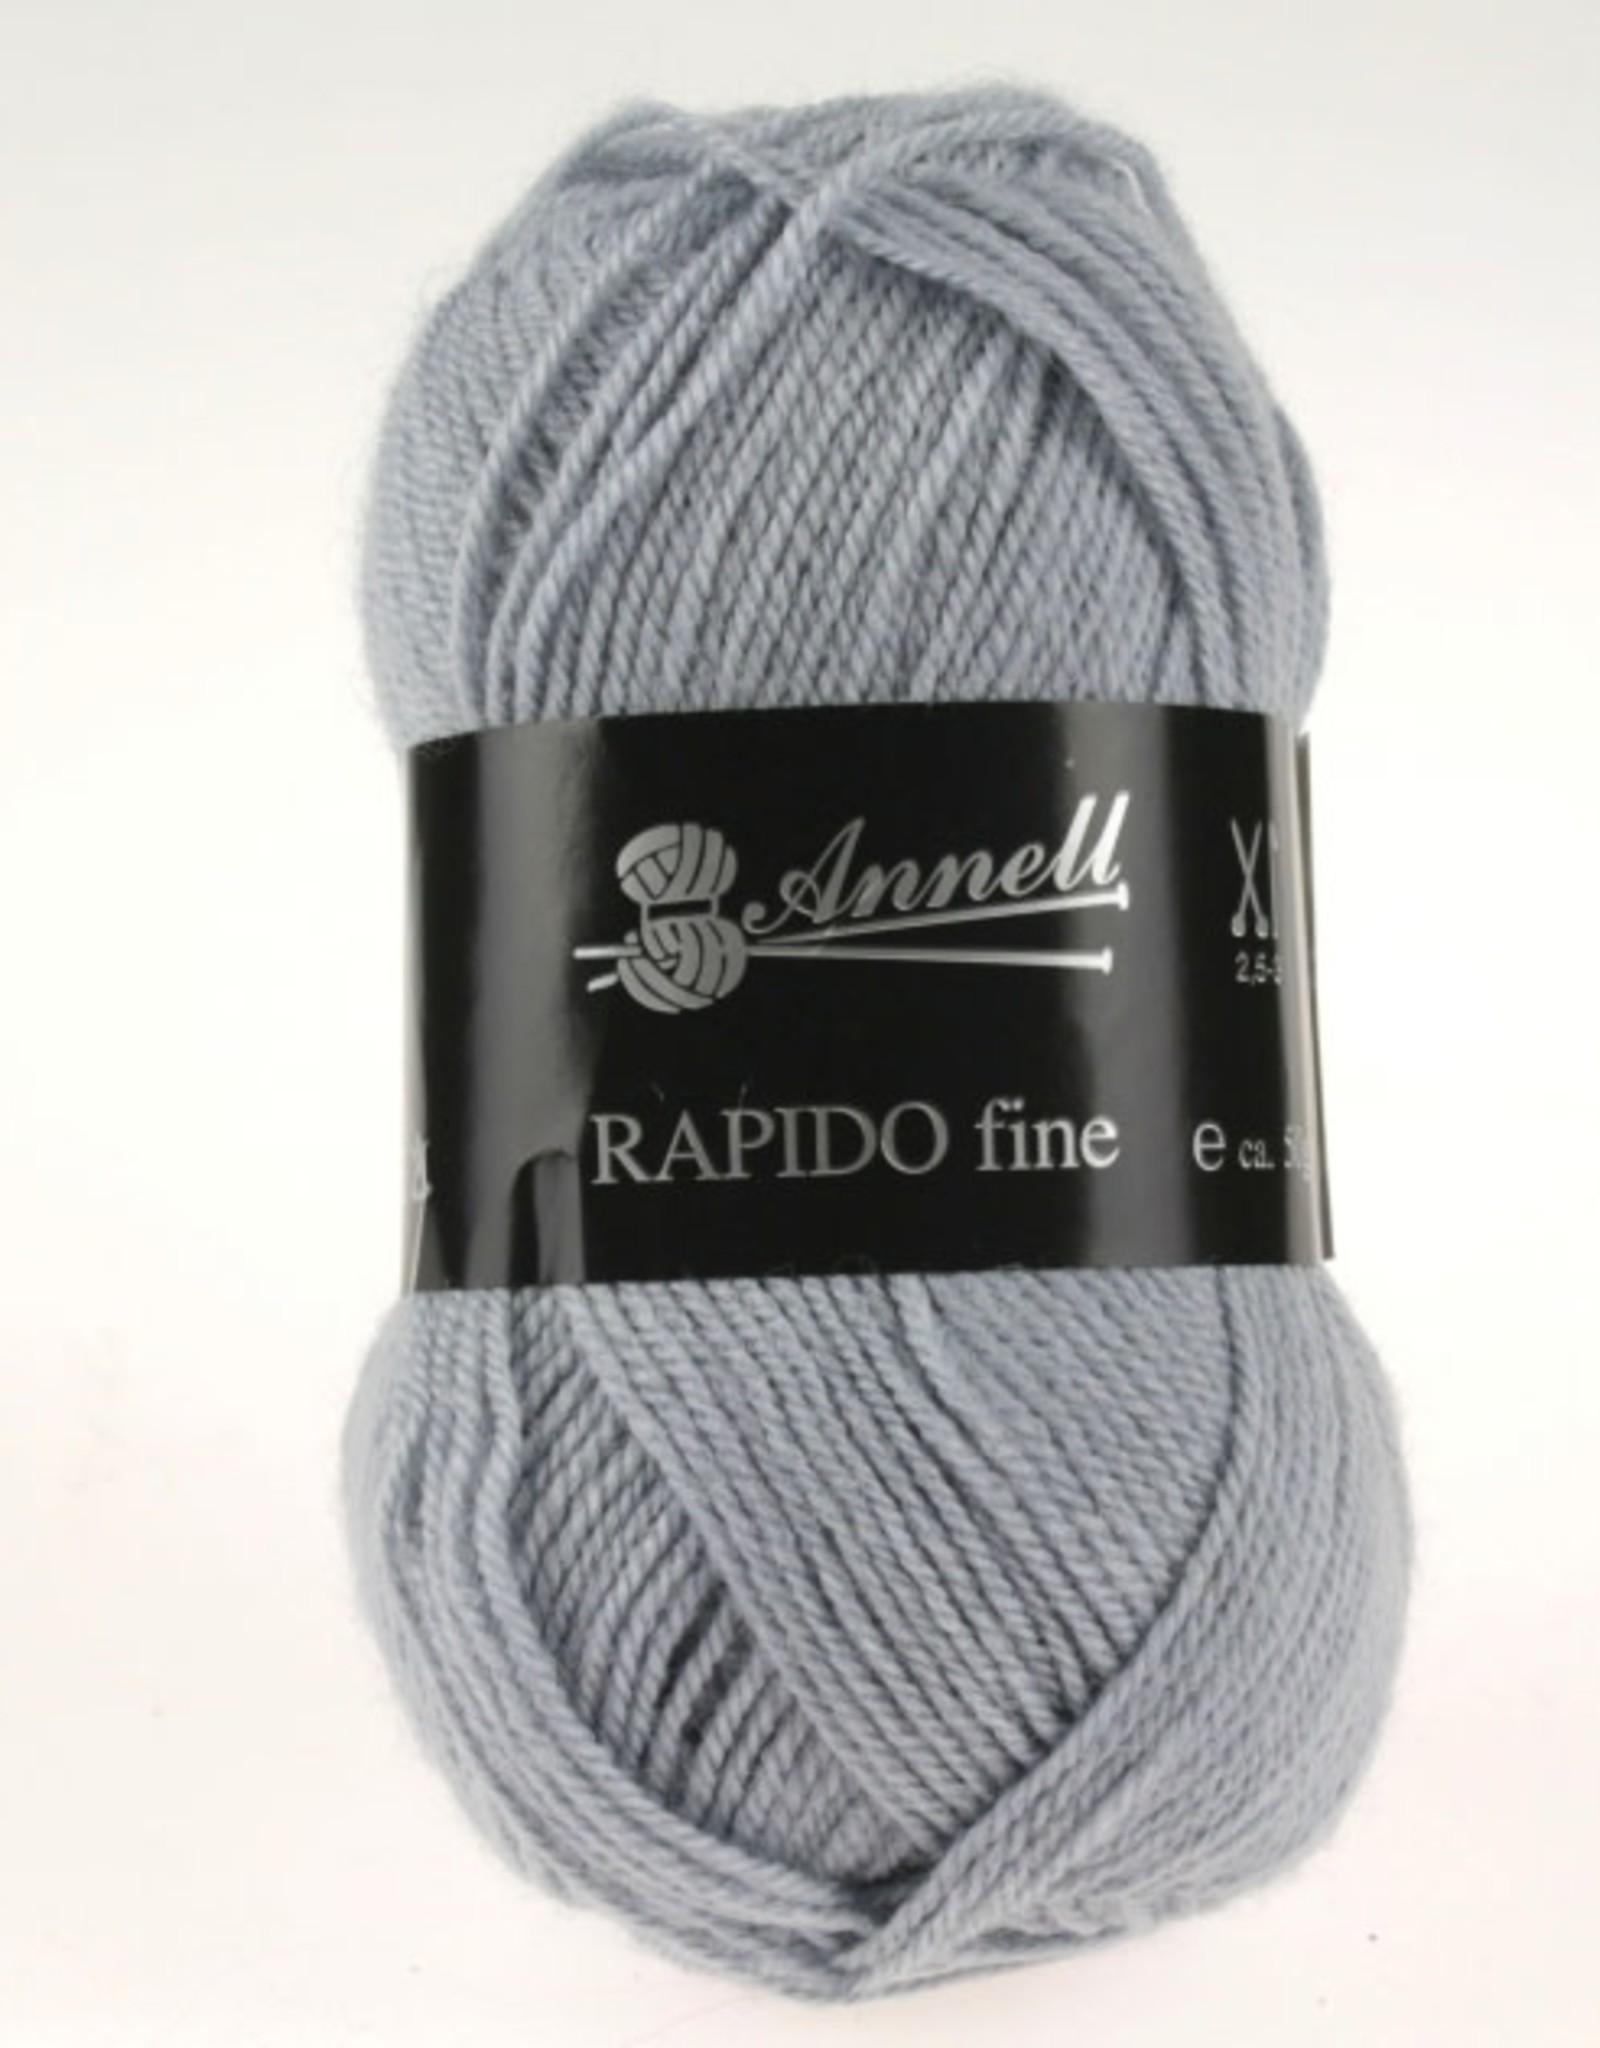 Annell Annell rapido fine 8239